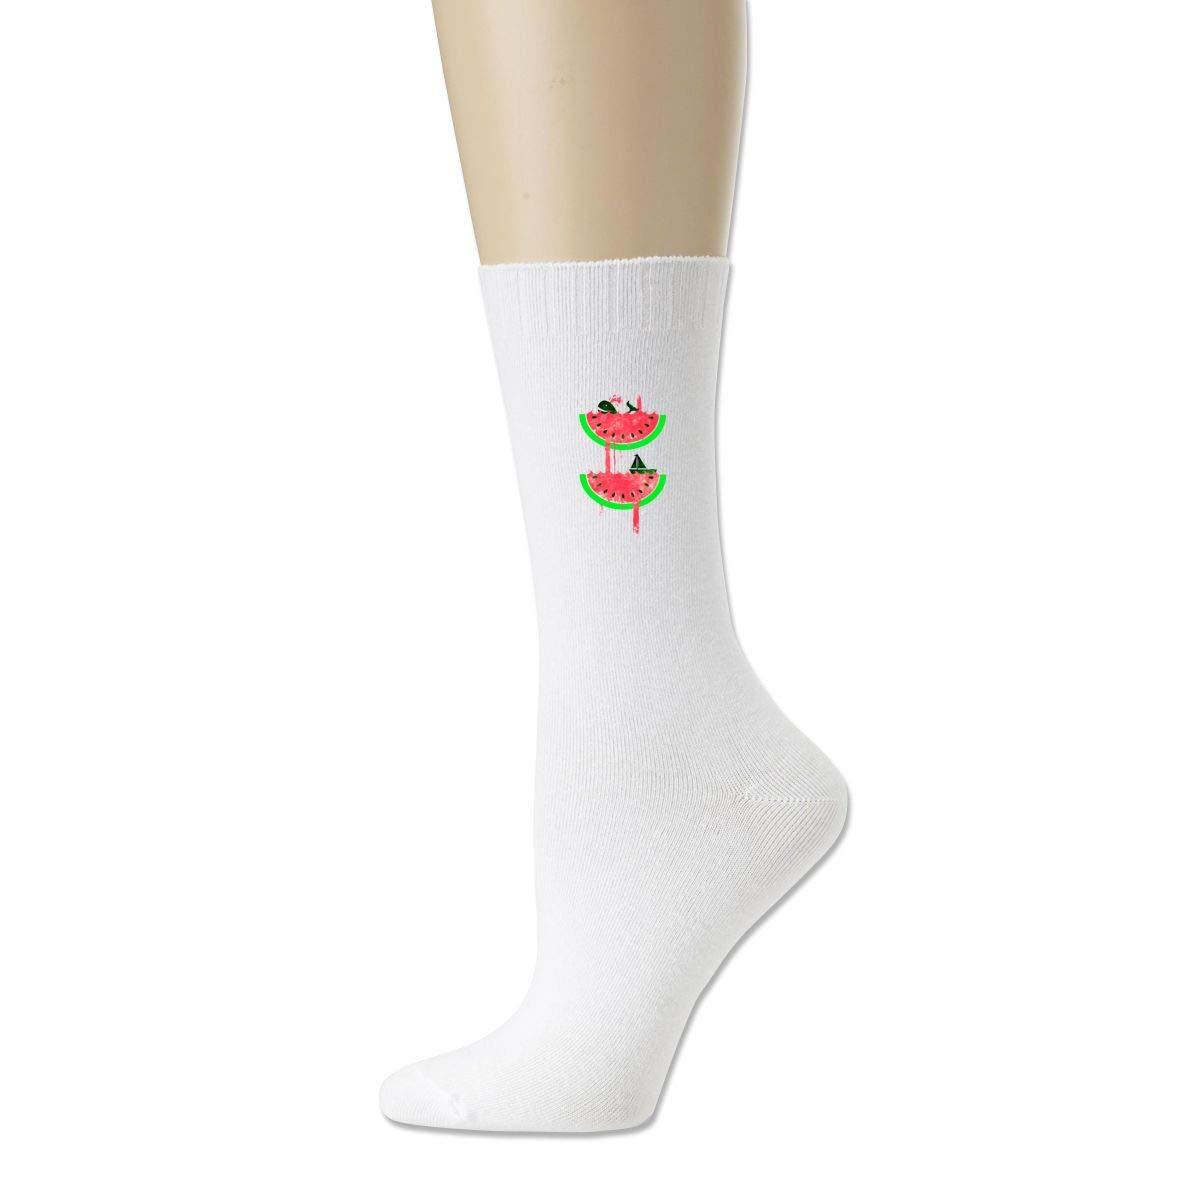 Rigg-socks Watermelon Falls For Men Comfortable Sport Socks Black